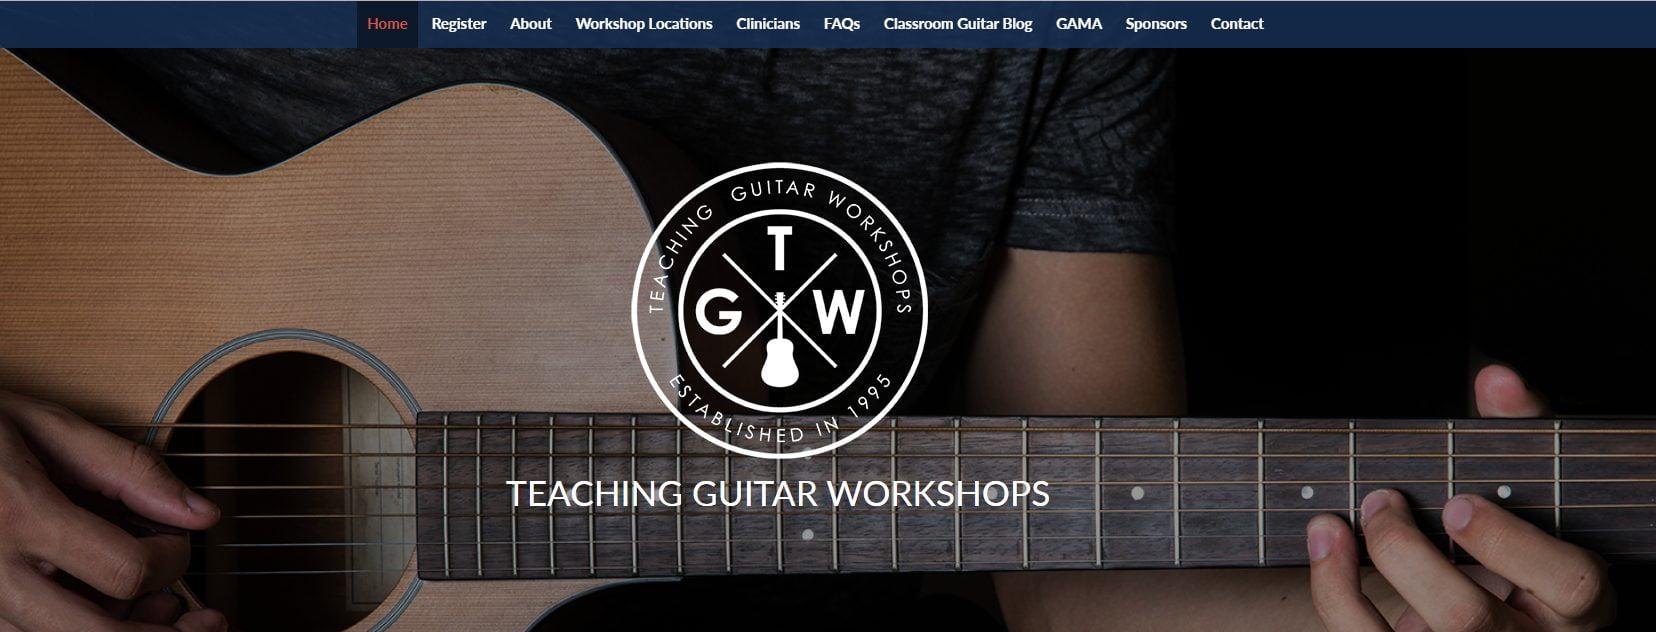 Teaching Guitar Workshops